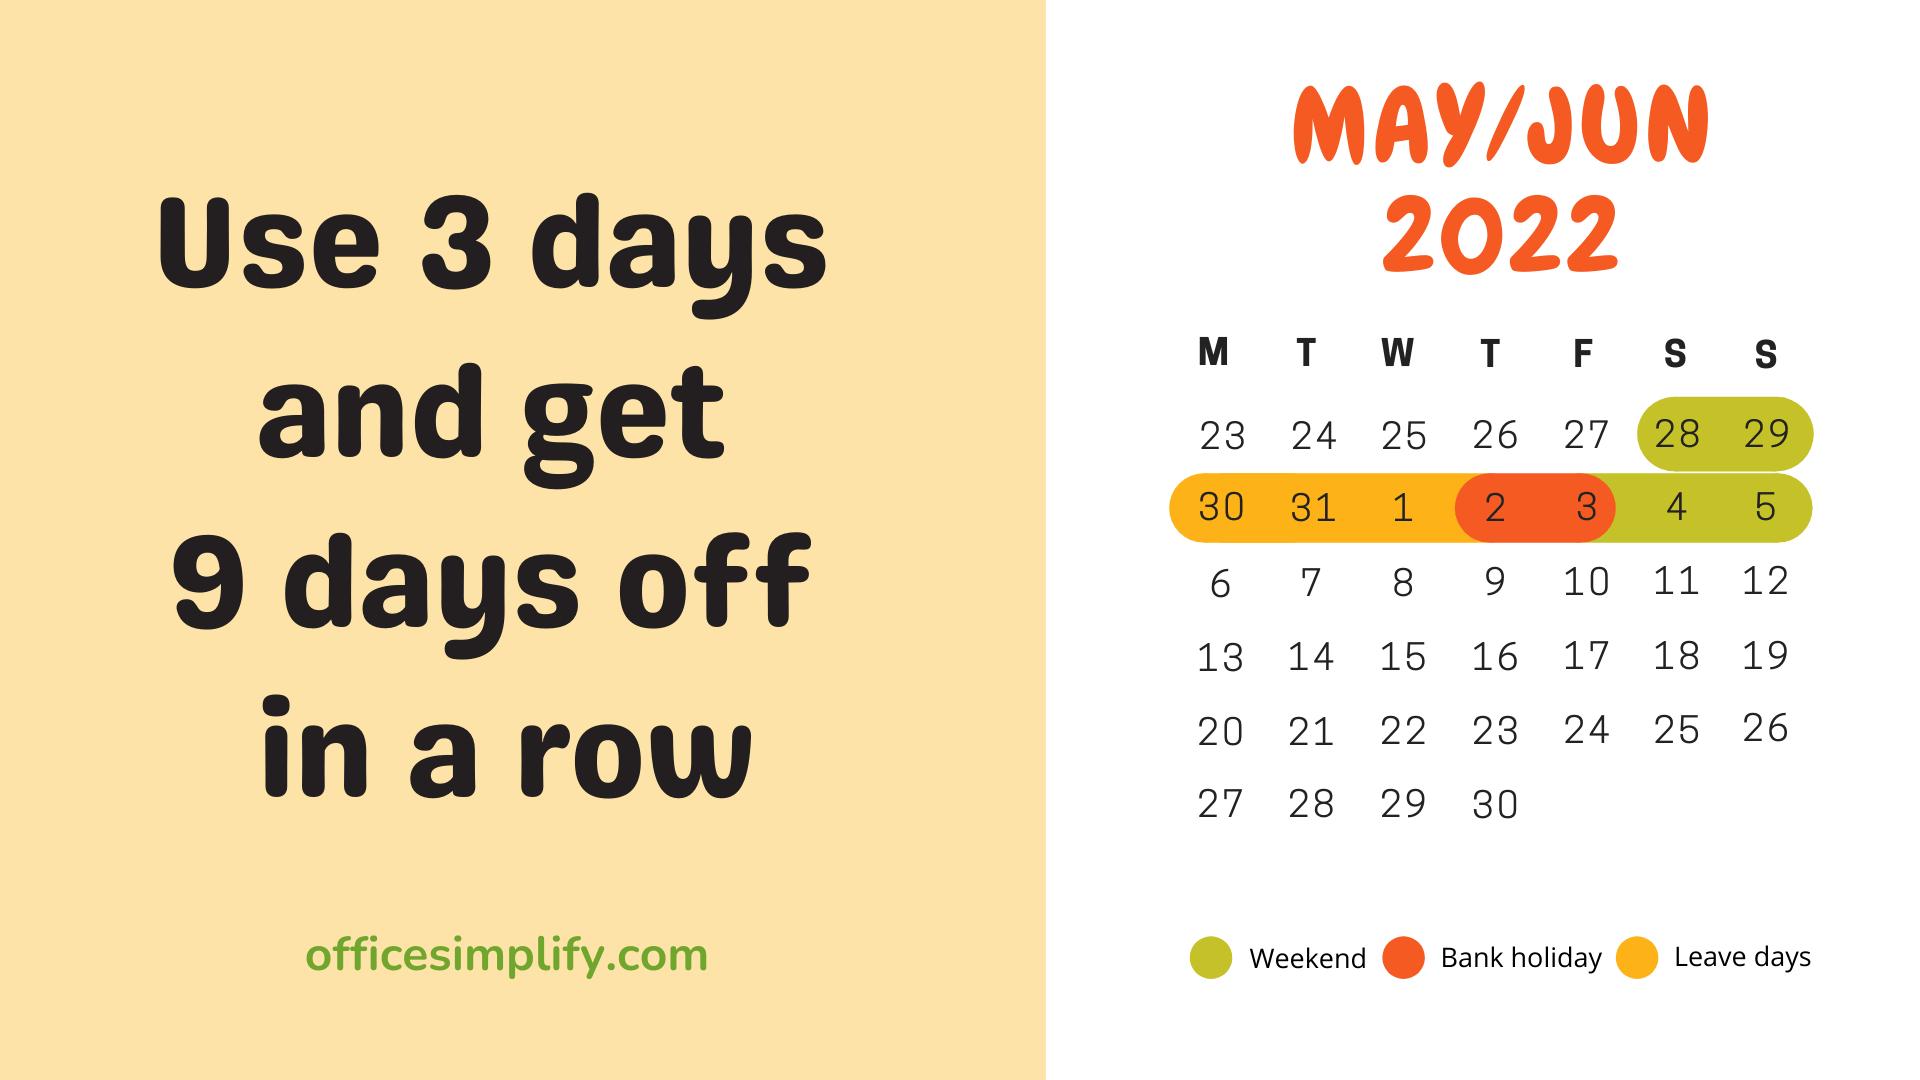 May/June 2022 employee leave plan